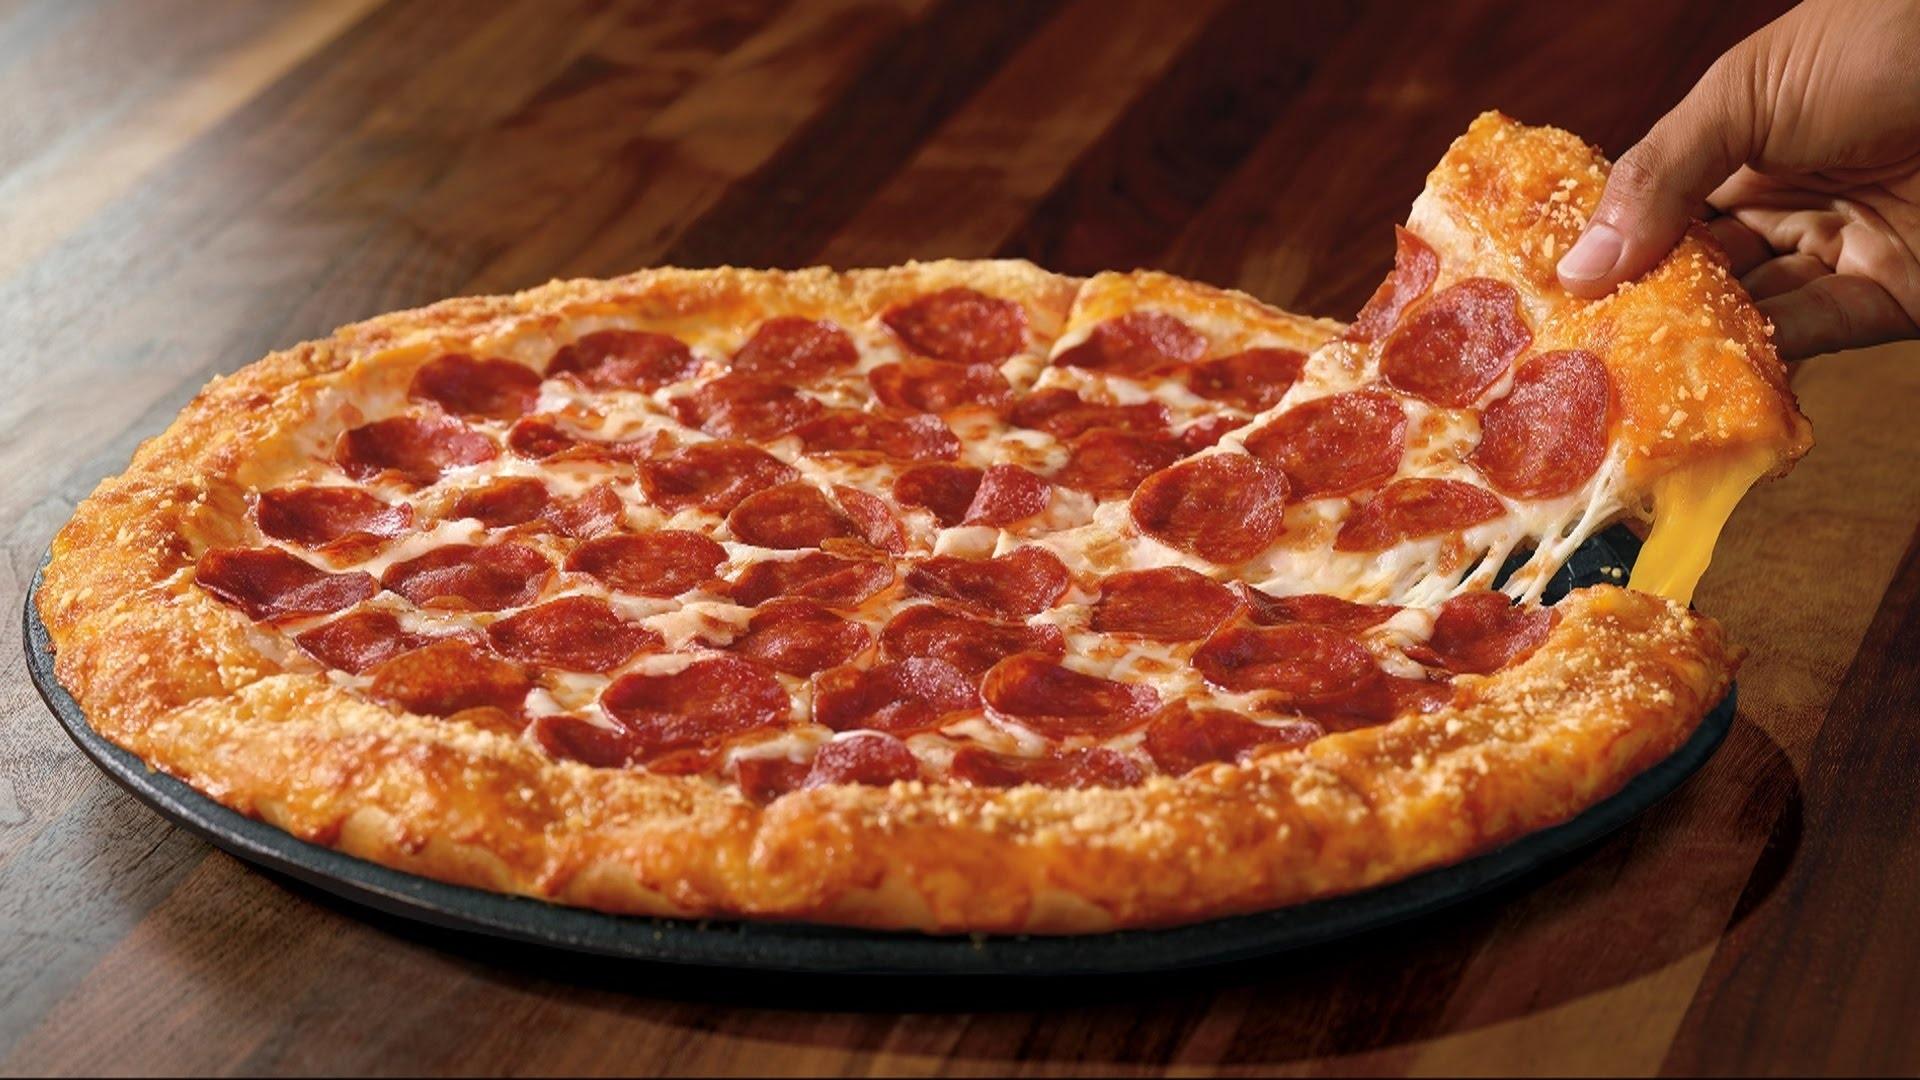 pizza-hut-stuffed-crust-pizza Cropped